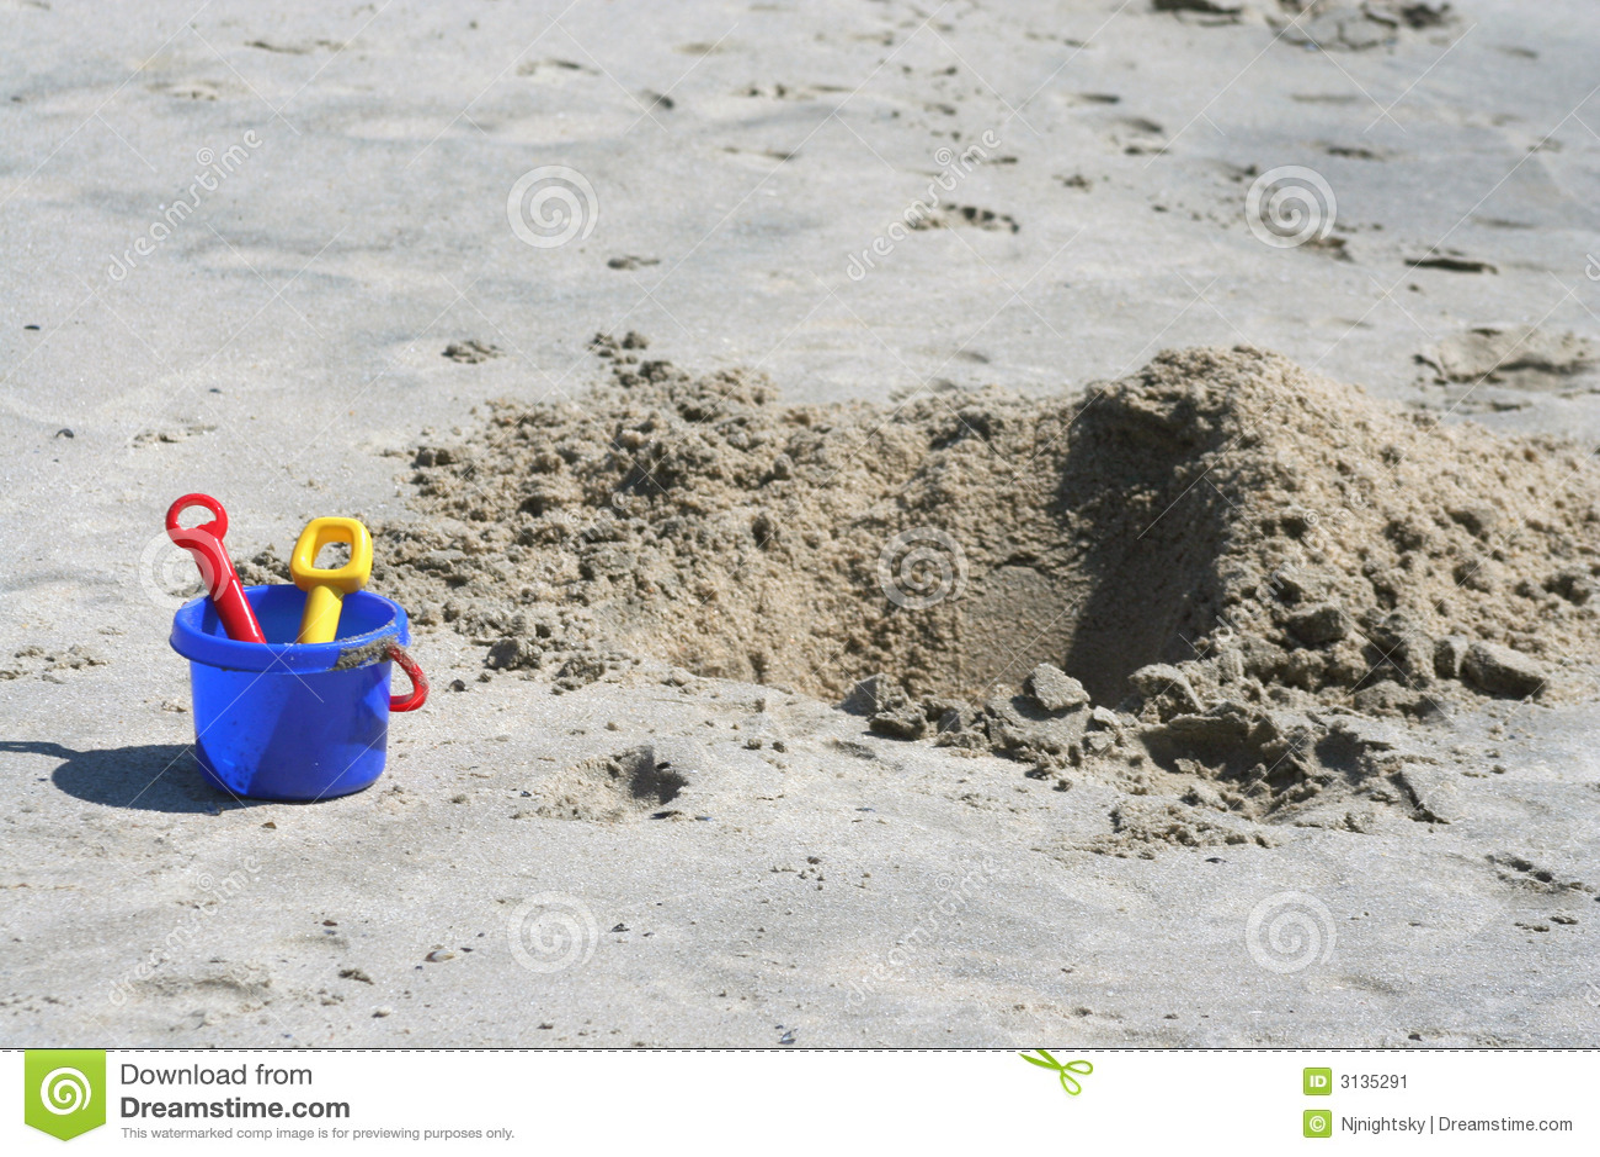 Shovel, pail and sand pit